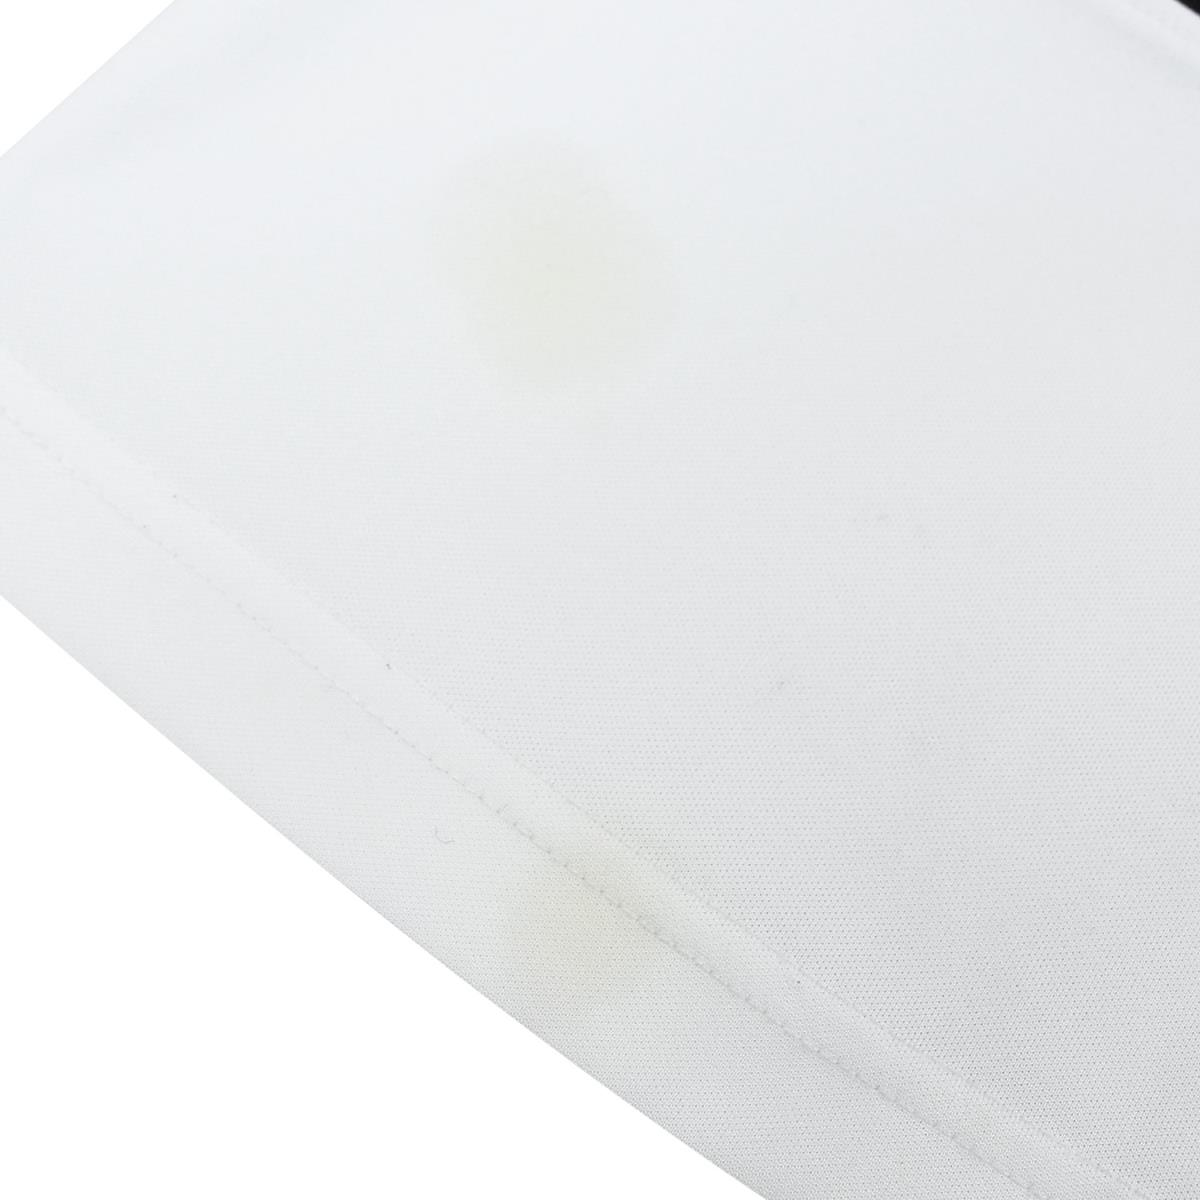 8fa4a564677 ... NIKE (Nike) 17A/W X GATORADE game shorts (GAME CHANGER SHORT) black